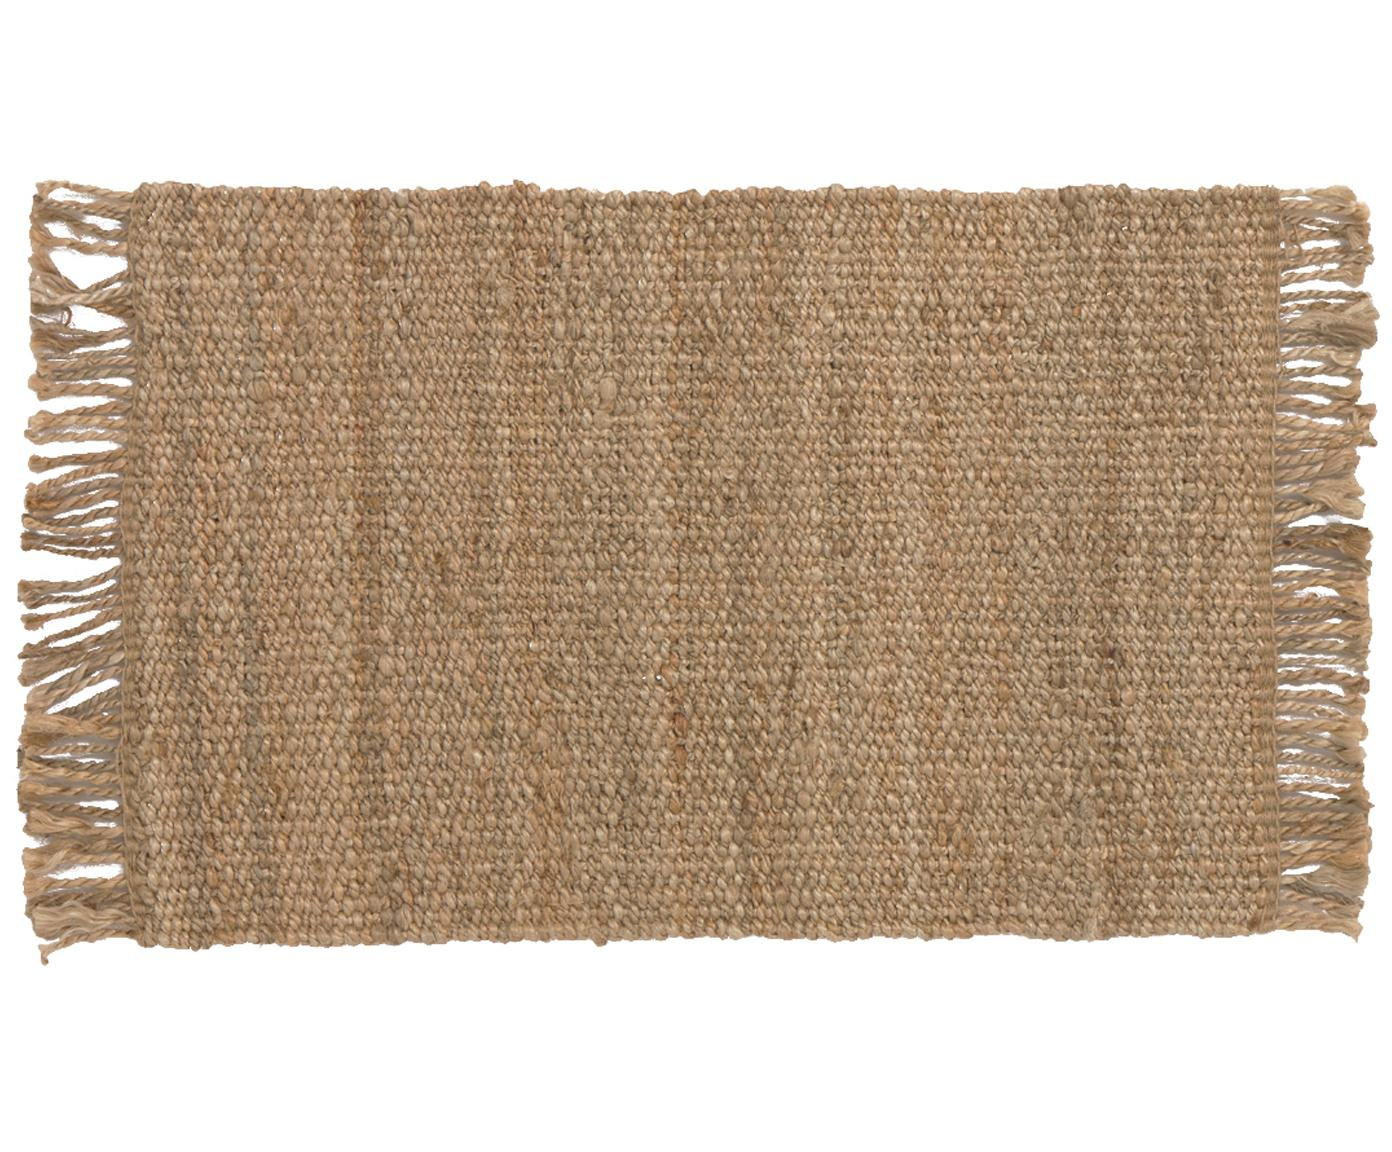 Tappeto in juta taftato a mano Cadiz, Juta, Juta, Larg. 150 x Lung. 200 cm (taglia S)